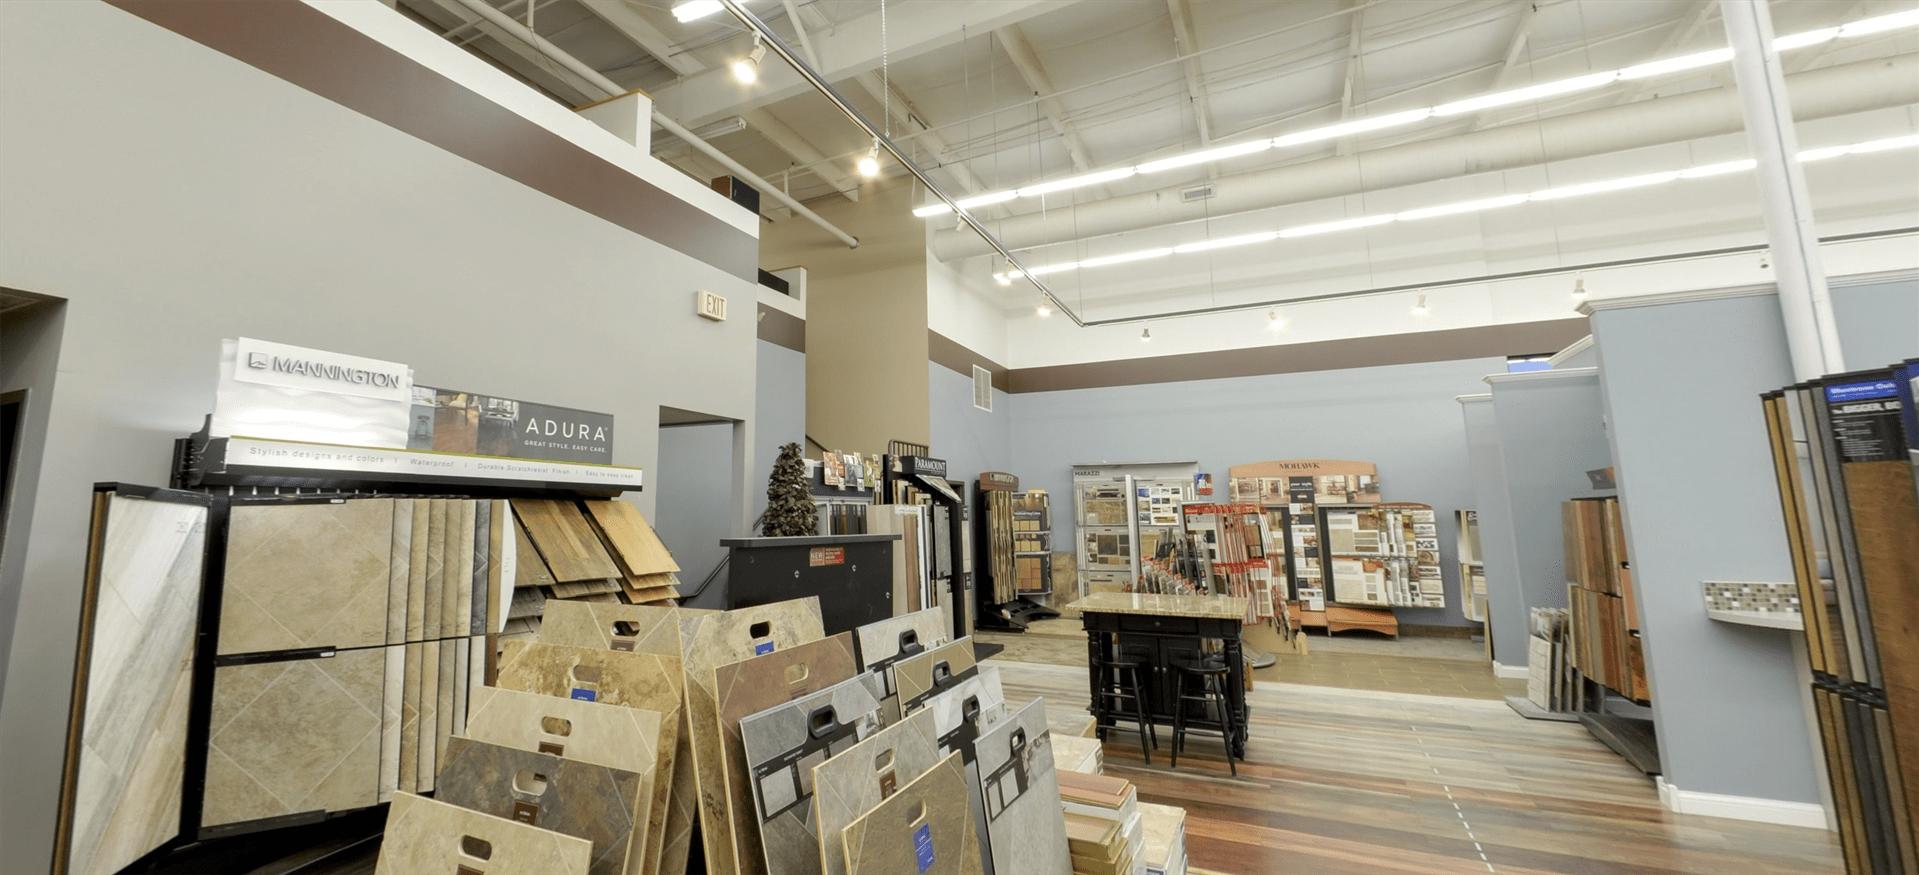 Mannington Adura flooring for your Minnesota business from Hiller Stores